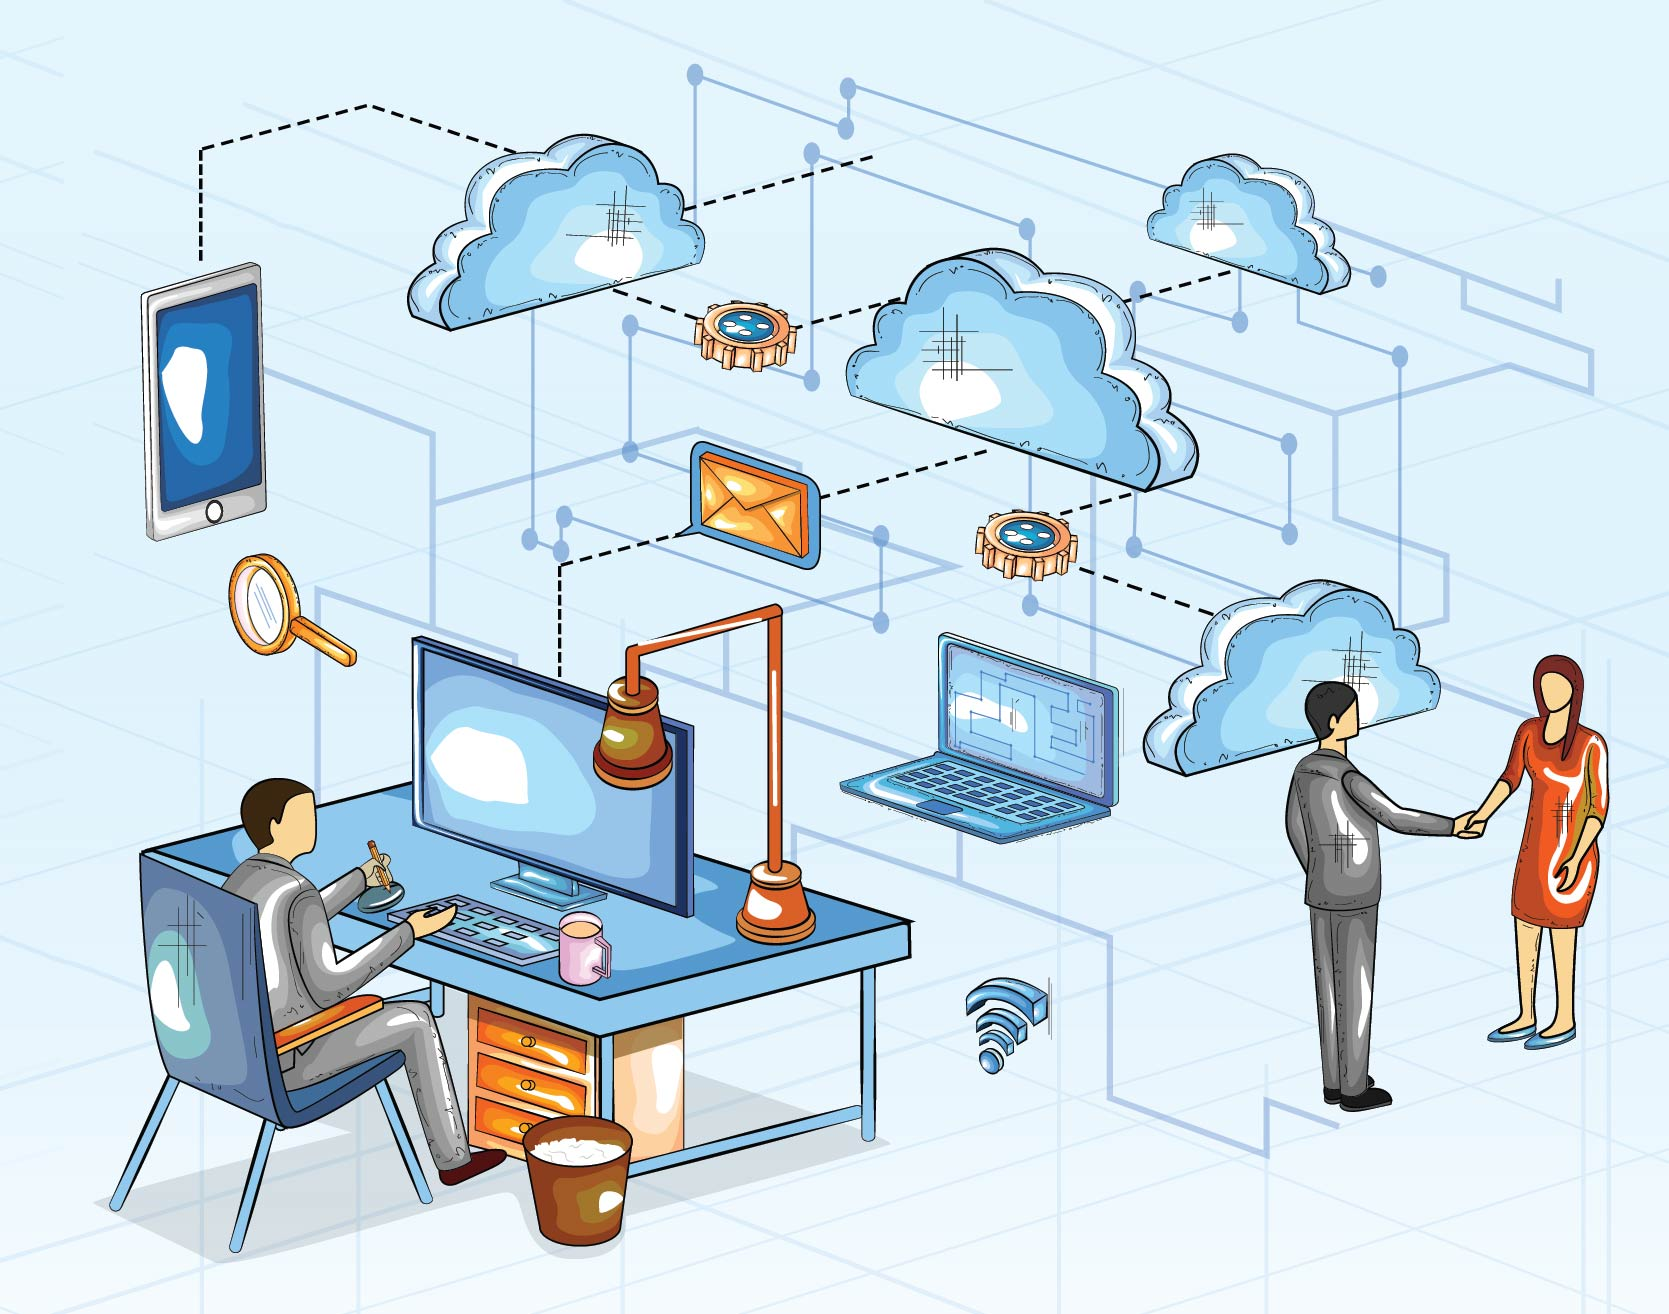 top 4 areas of vendor cybersecurity